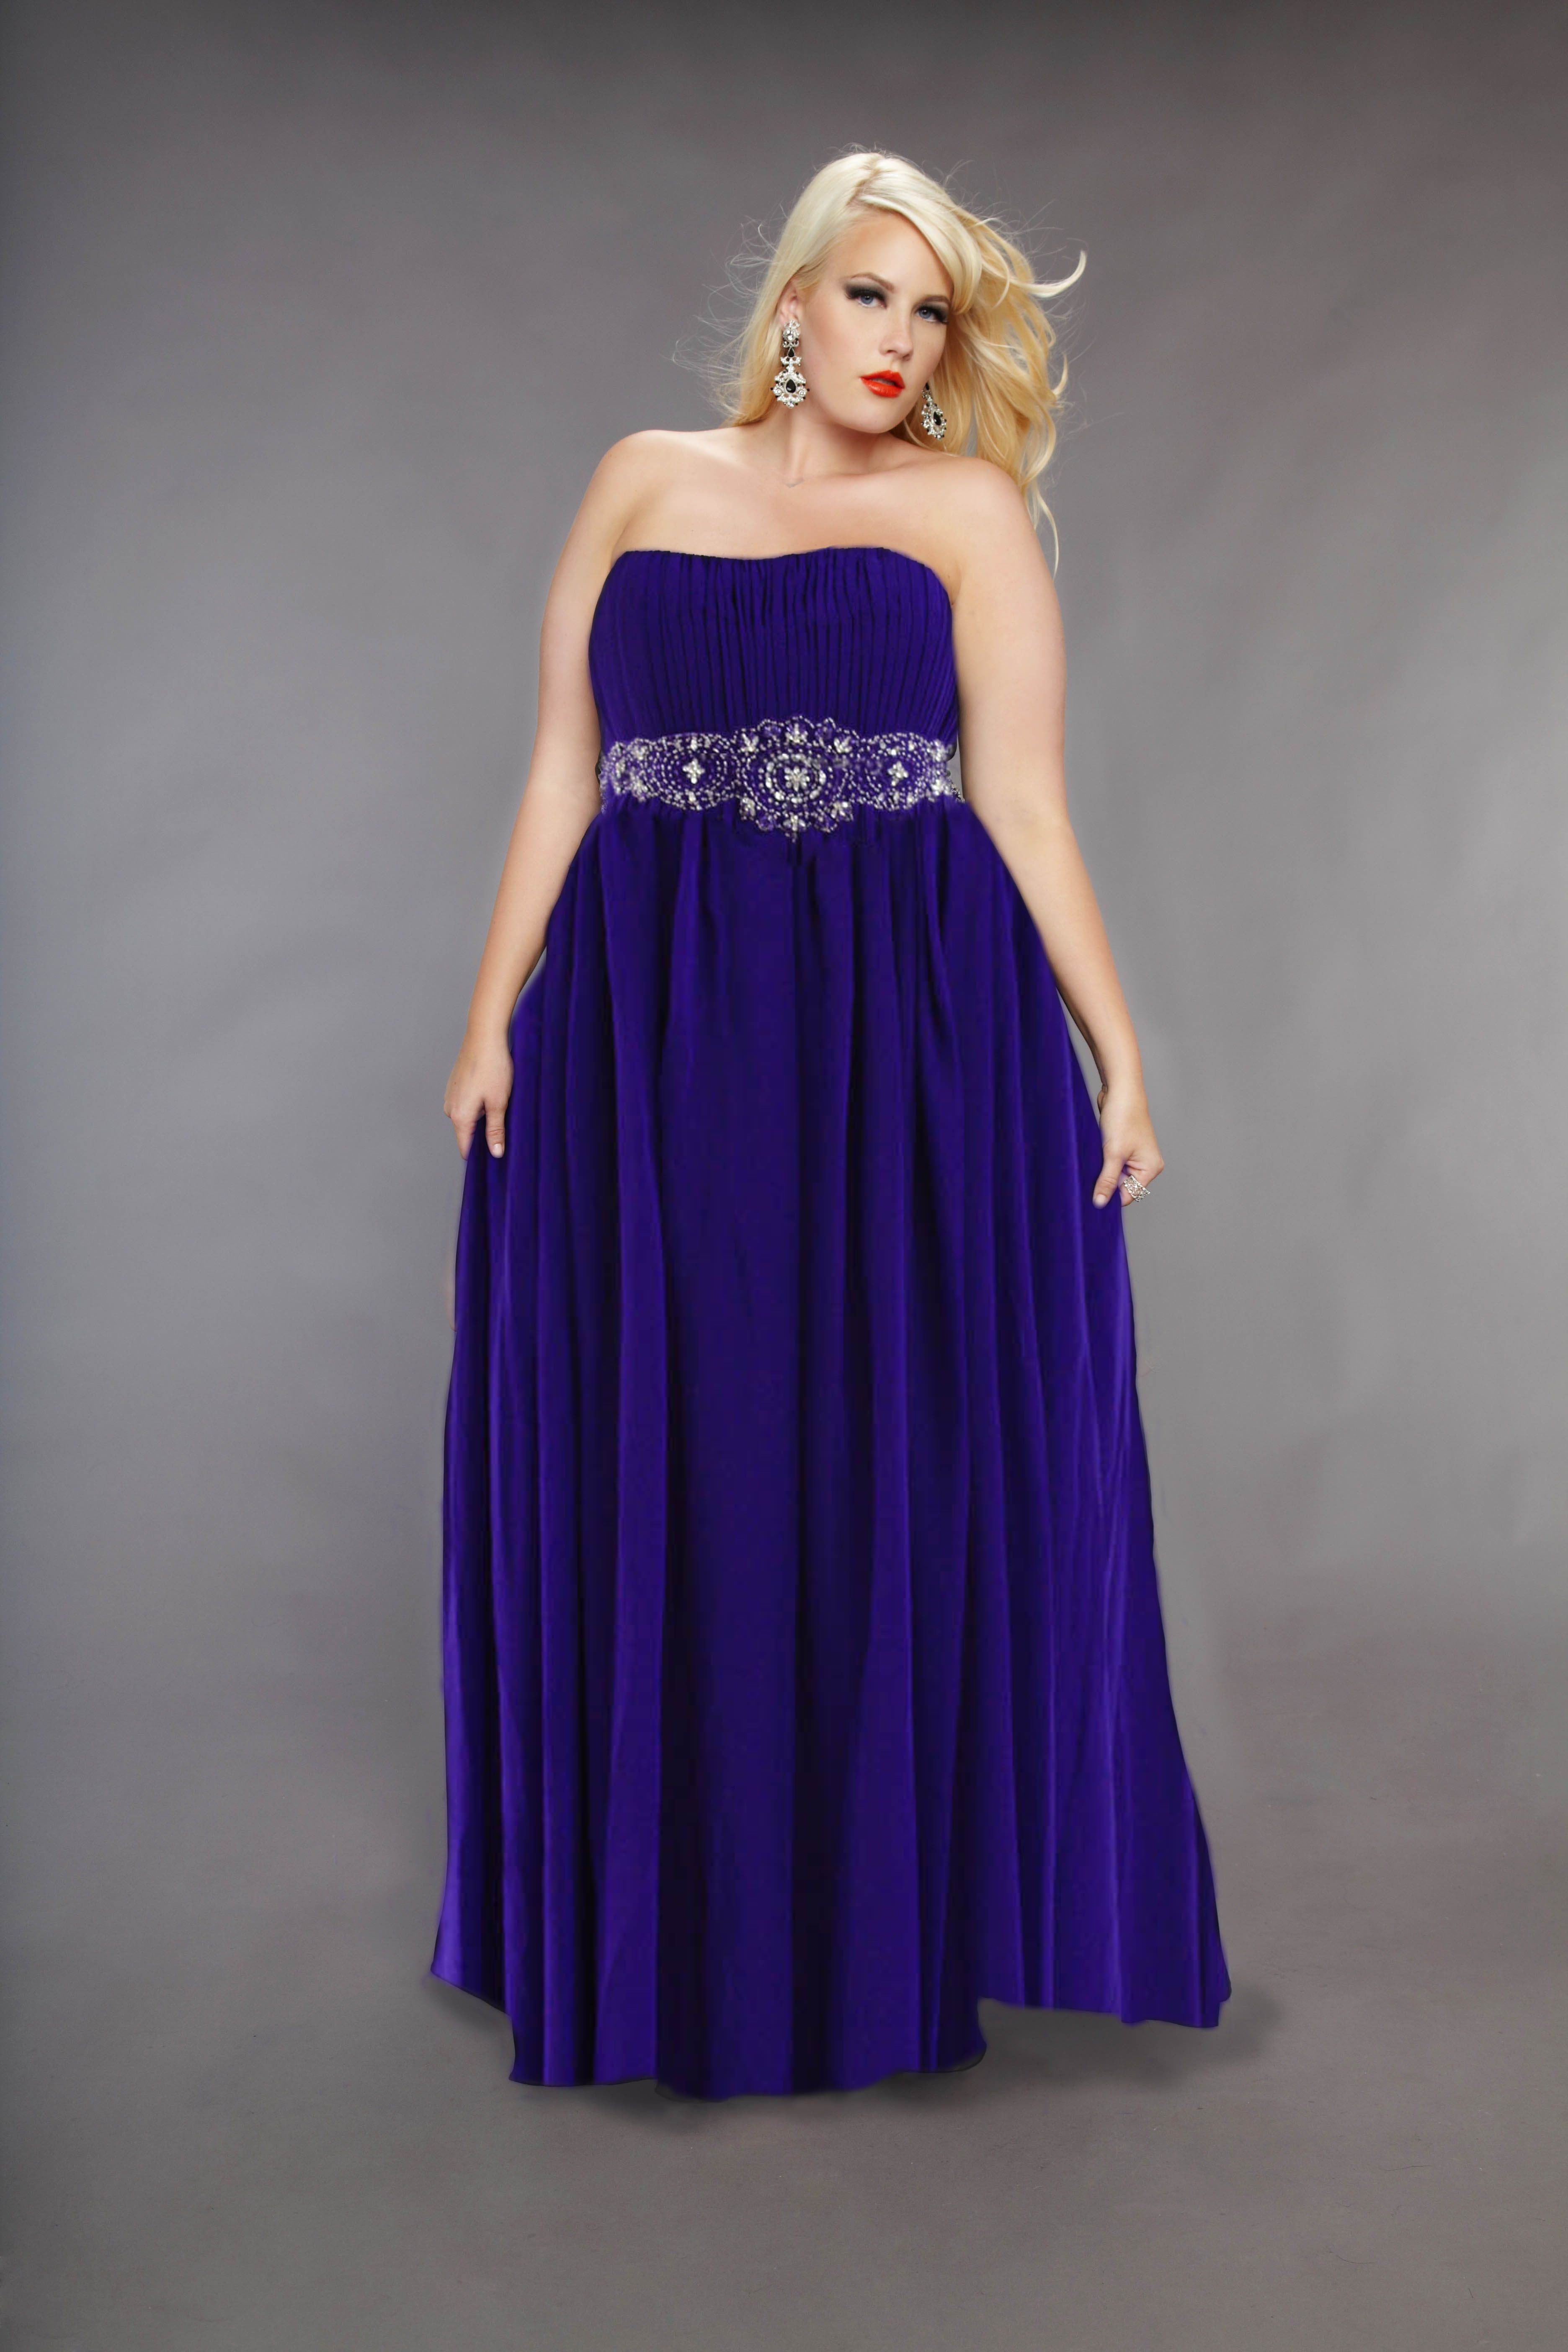 plus size prom dresses less than 100 | best dress ideas